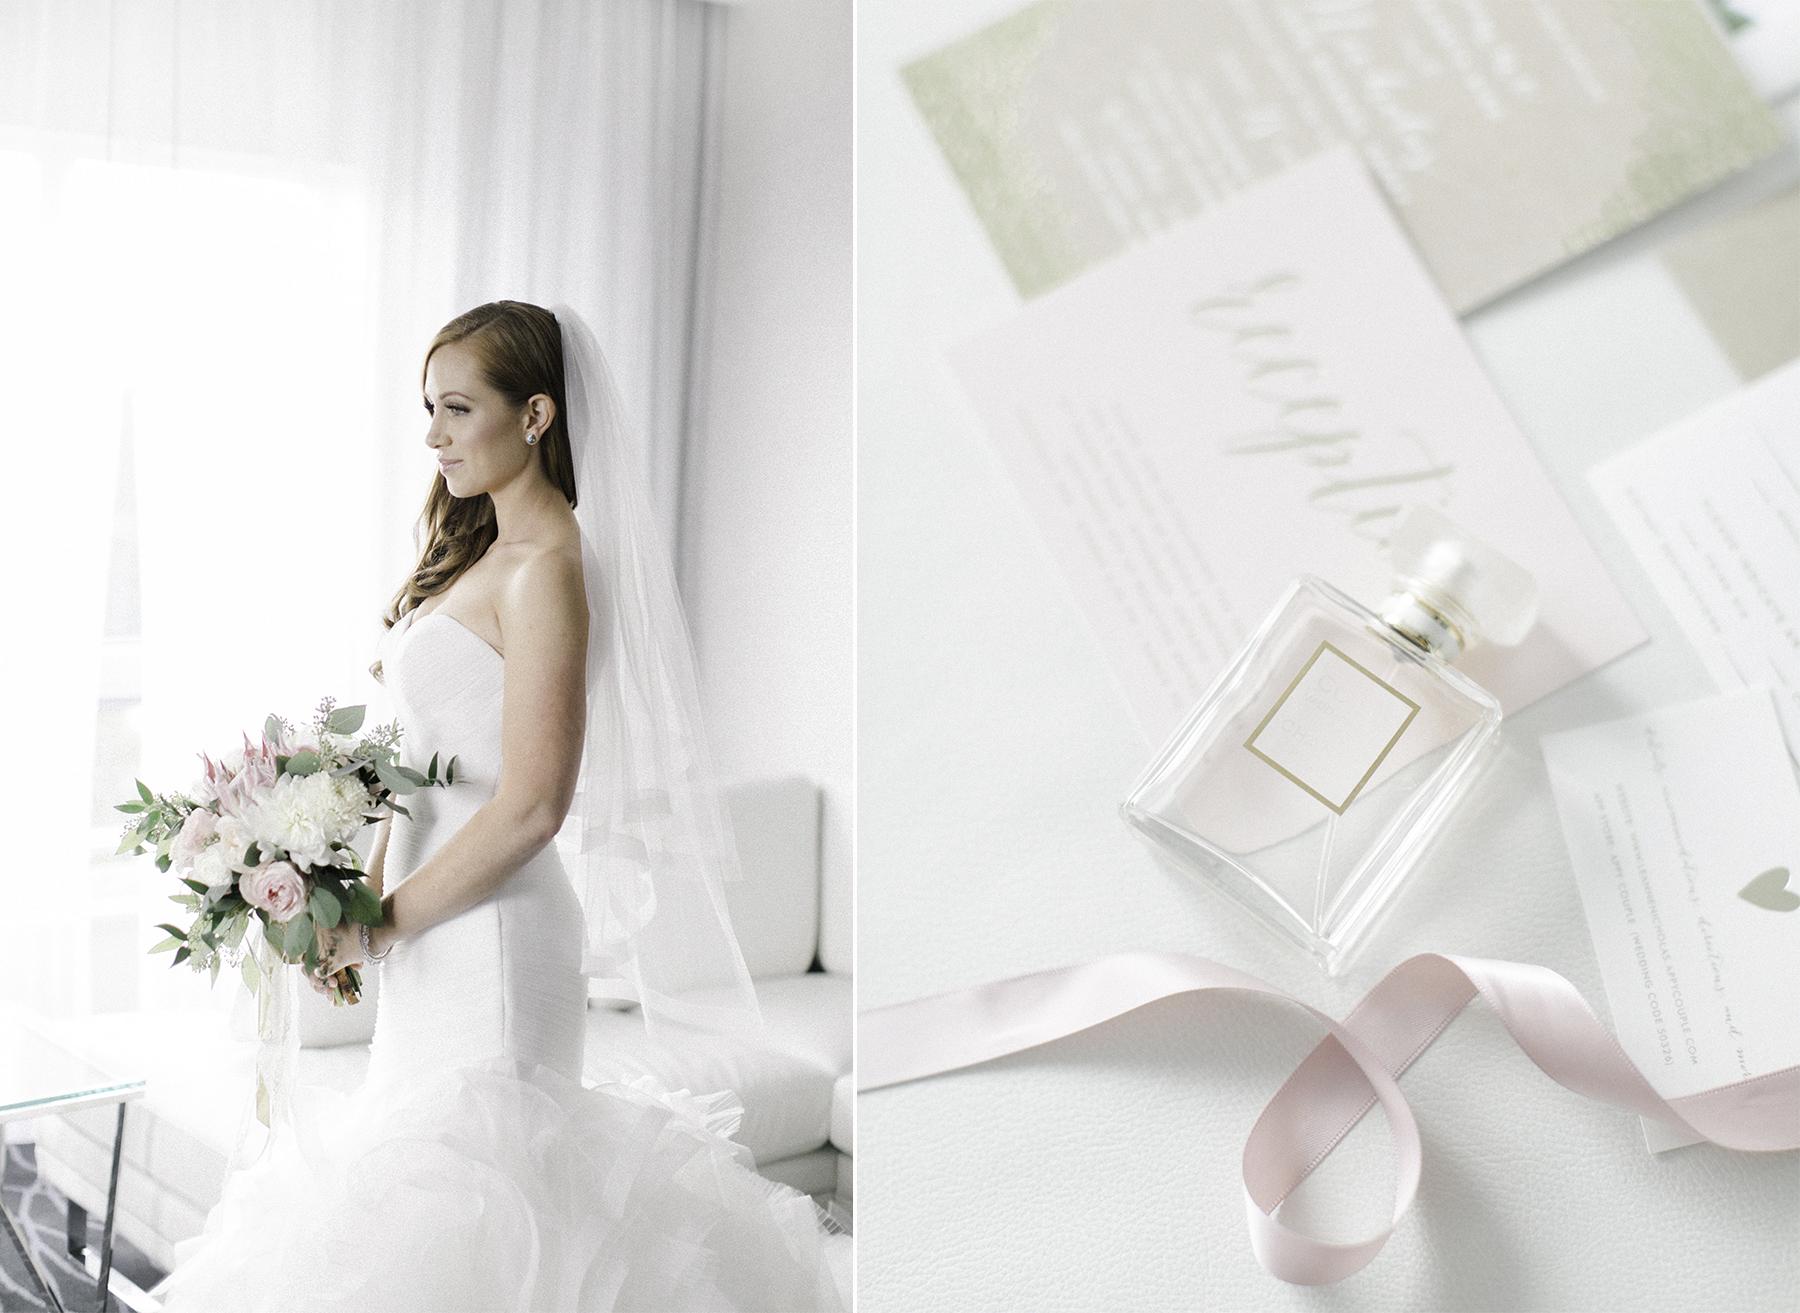 toronto-wedding-photographer-richelle-hunter-leanne-nick-2.jpg